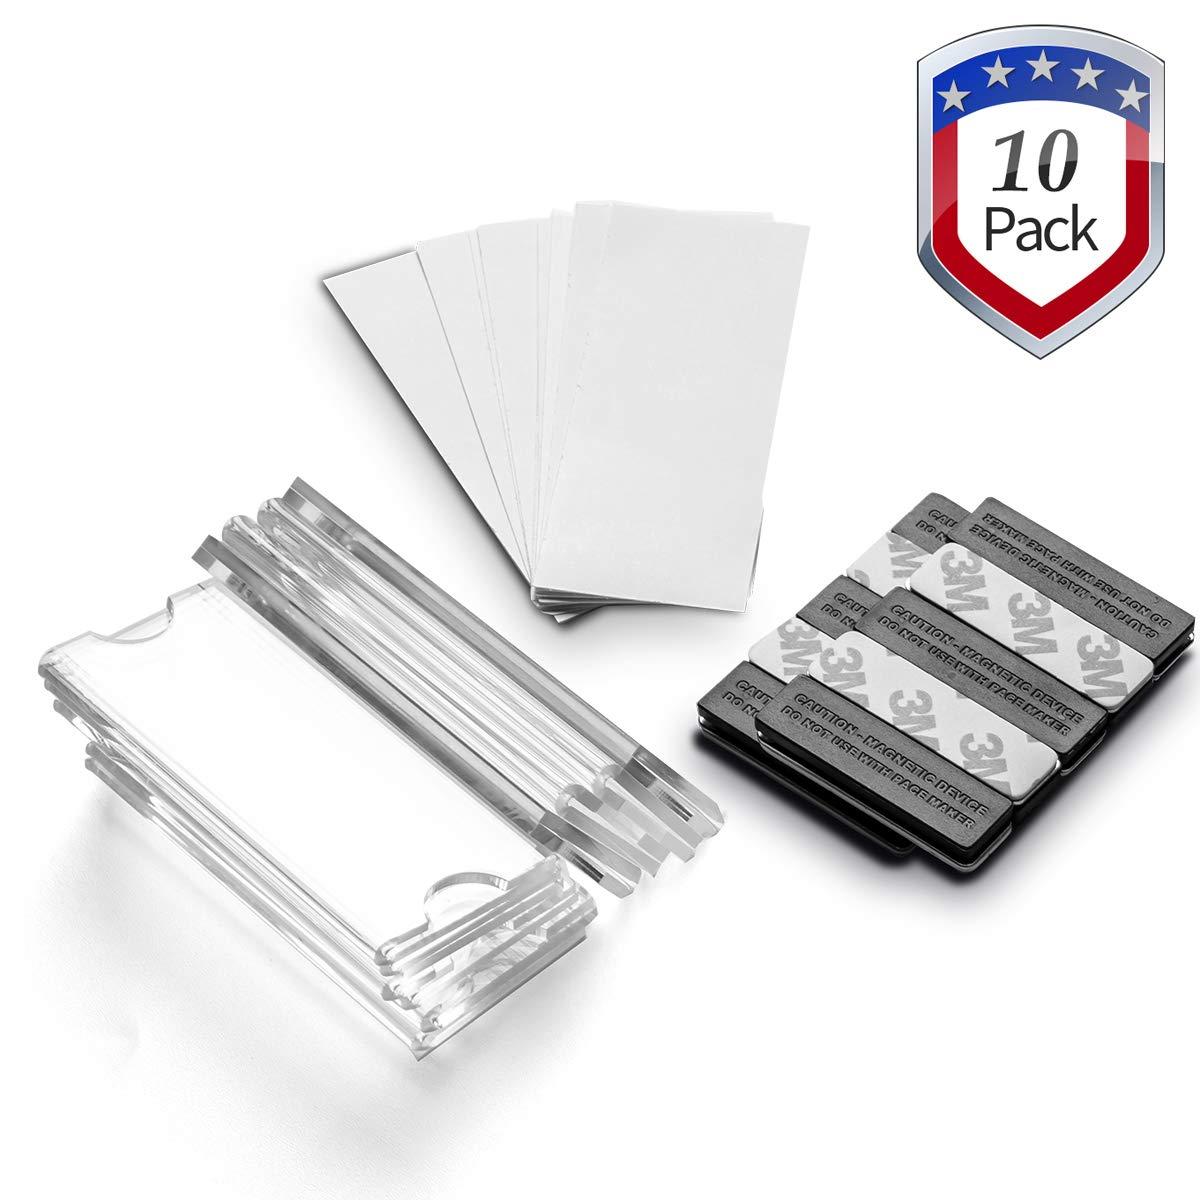 Magnetic Neodymium Adhesive Printable Business